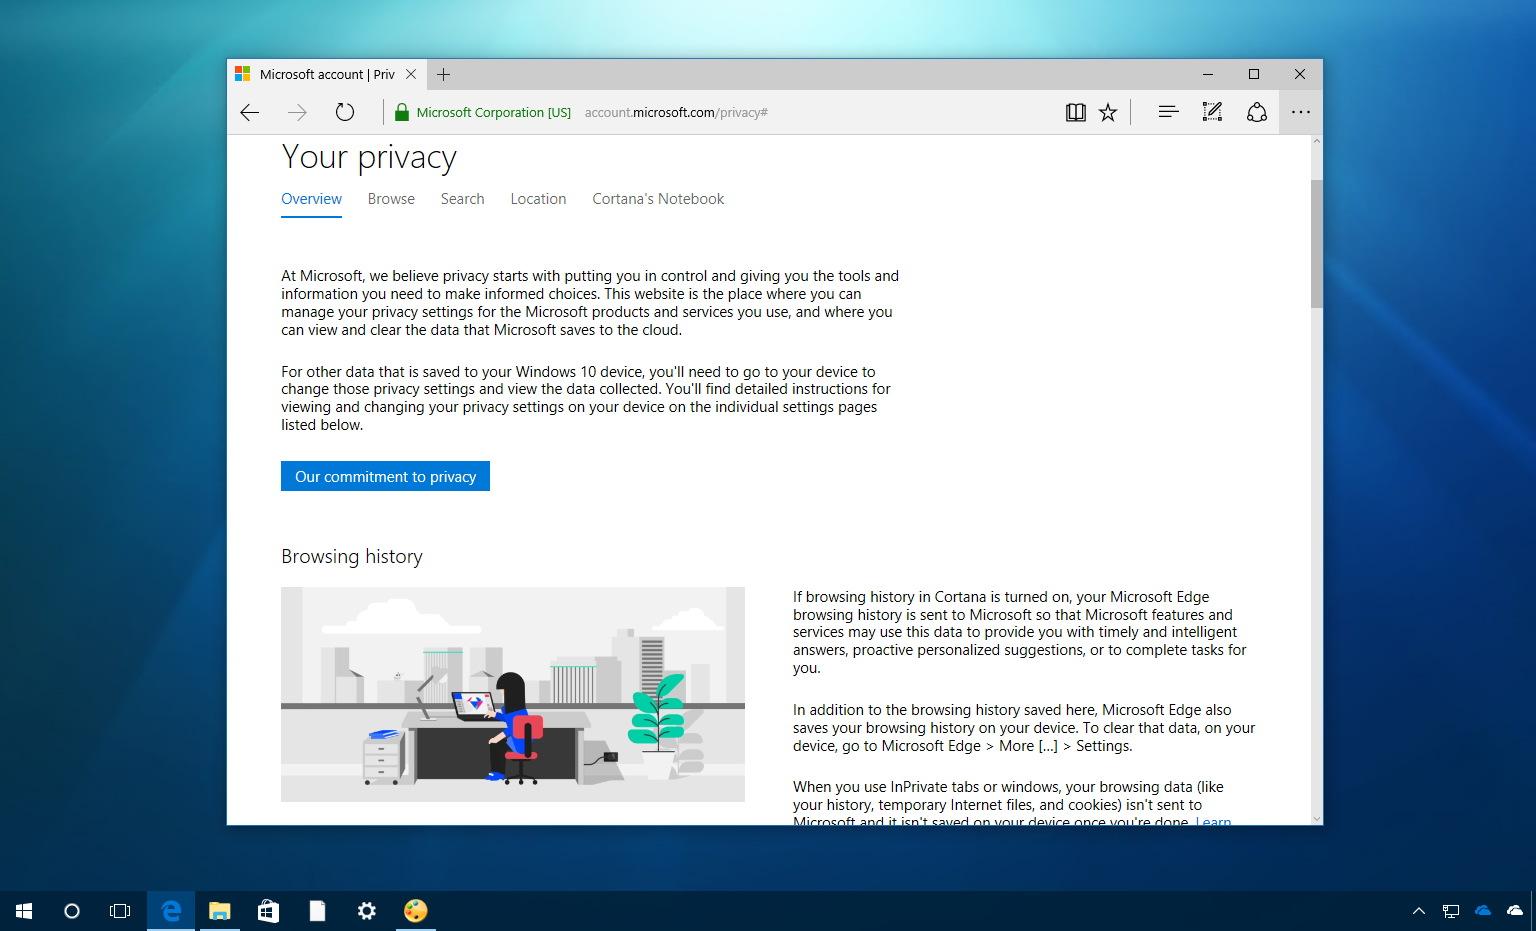 Microsoft privacy dashboard